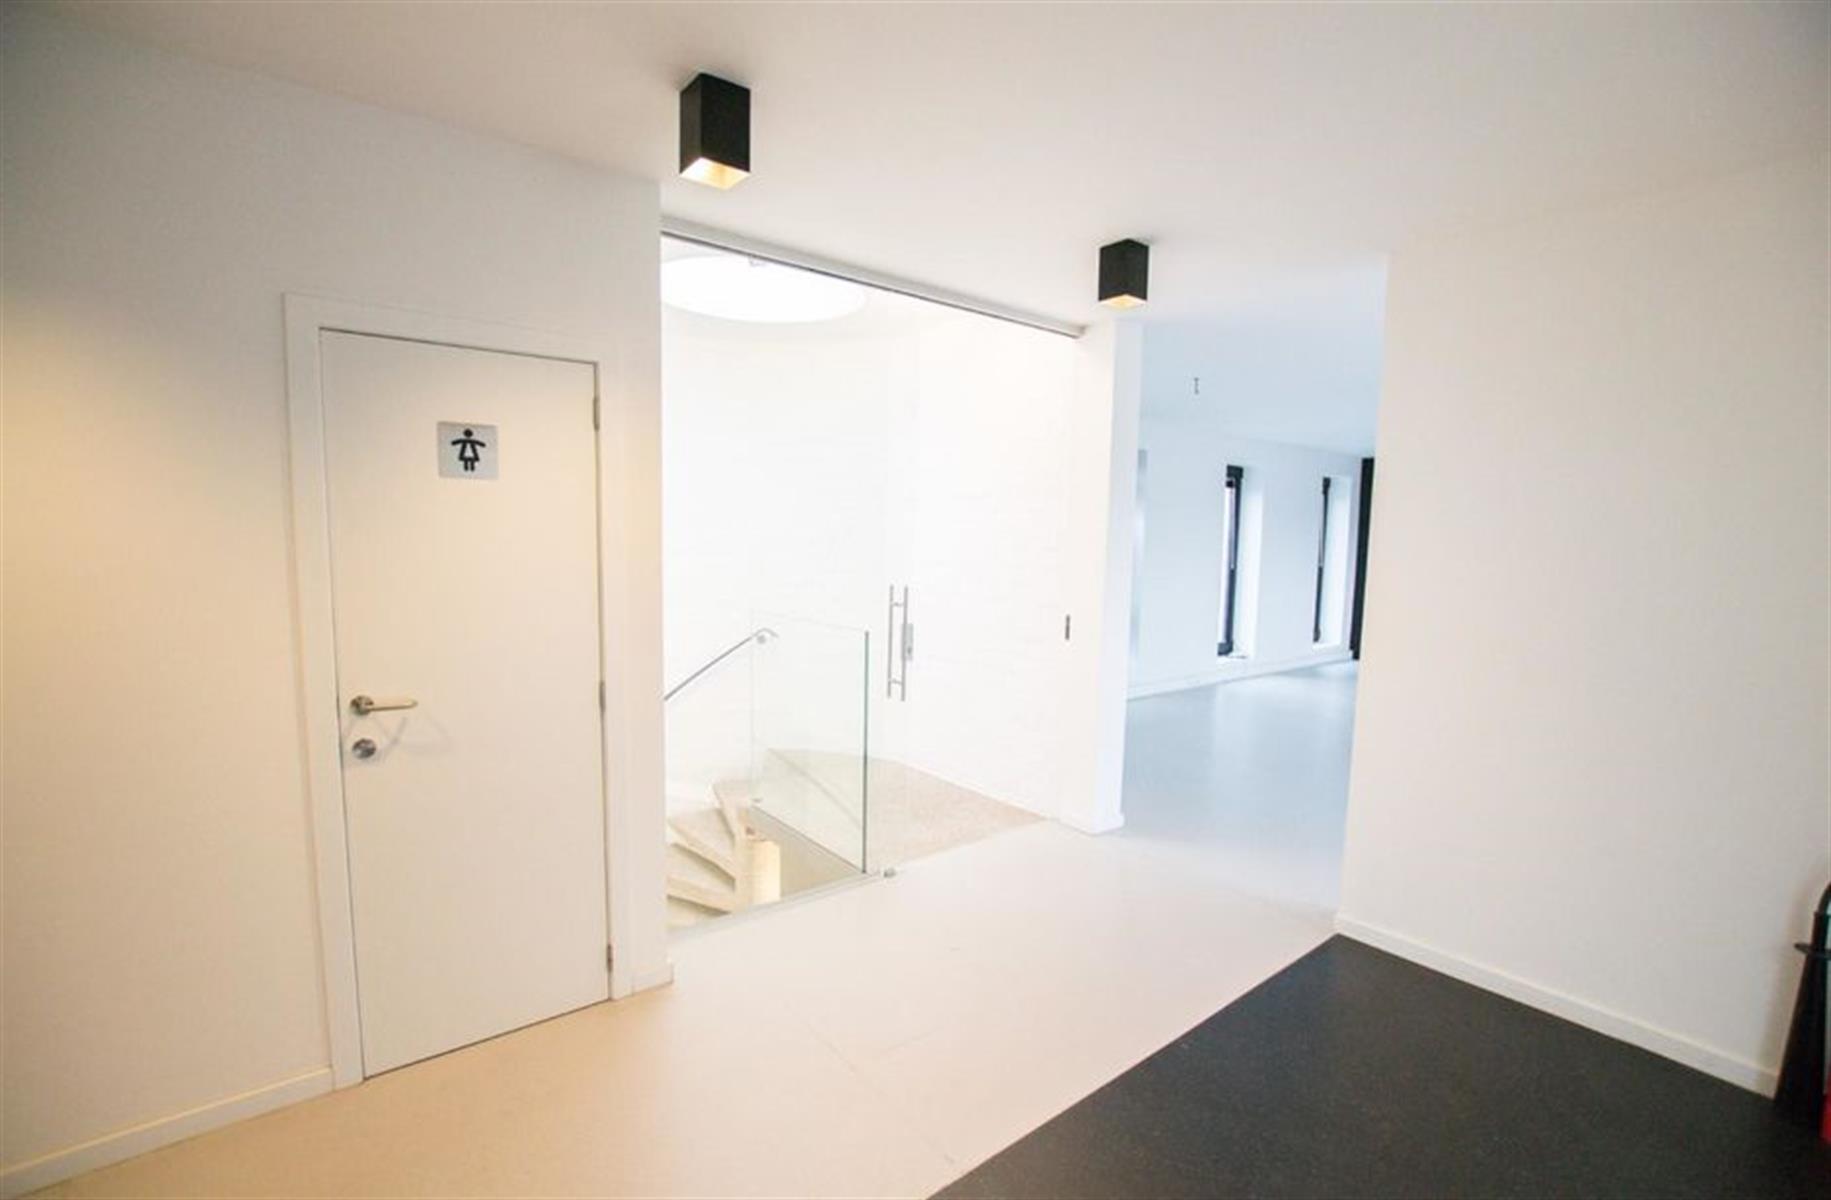 kantoor te huur K003 - Middelmolenlaan 96, 2100 Antwerpen Deurne, België 2